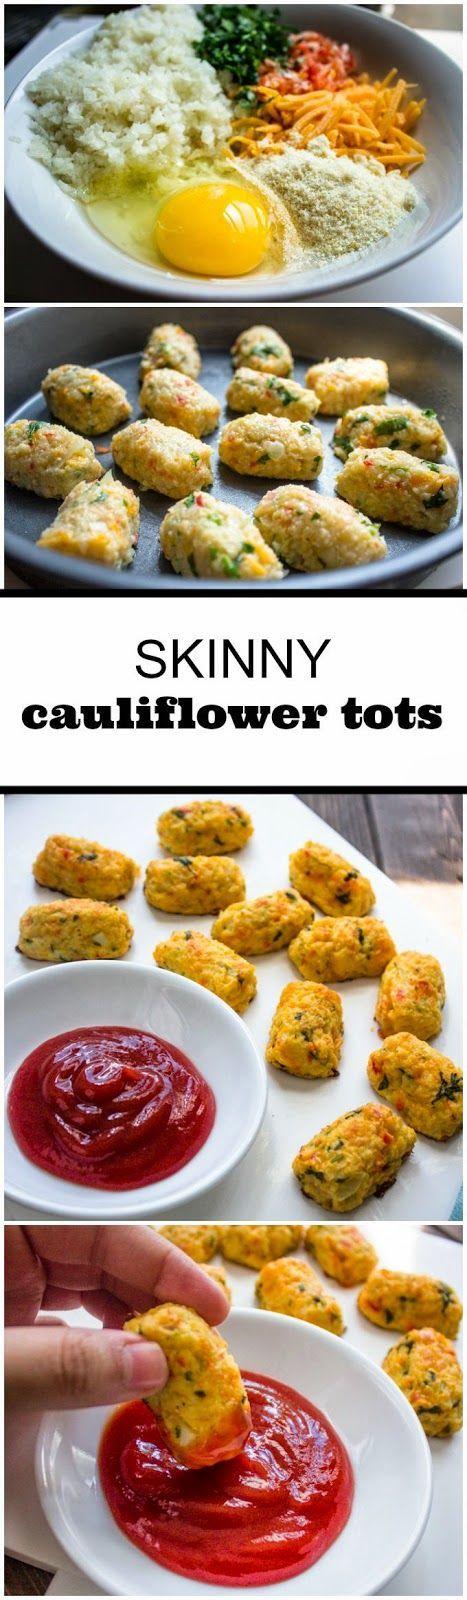 Everything Everywhere: Skinny Baked Cauliflower Tots